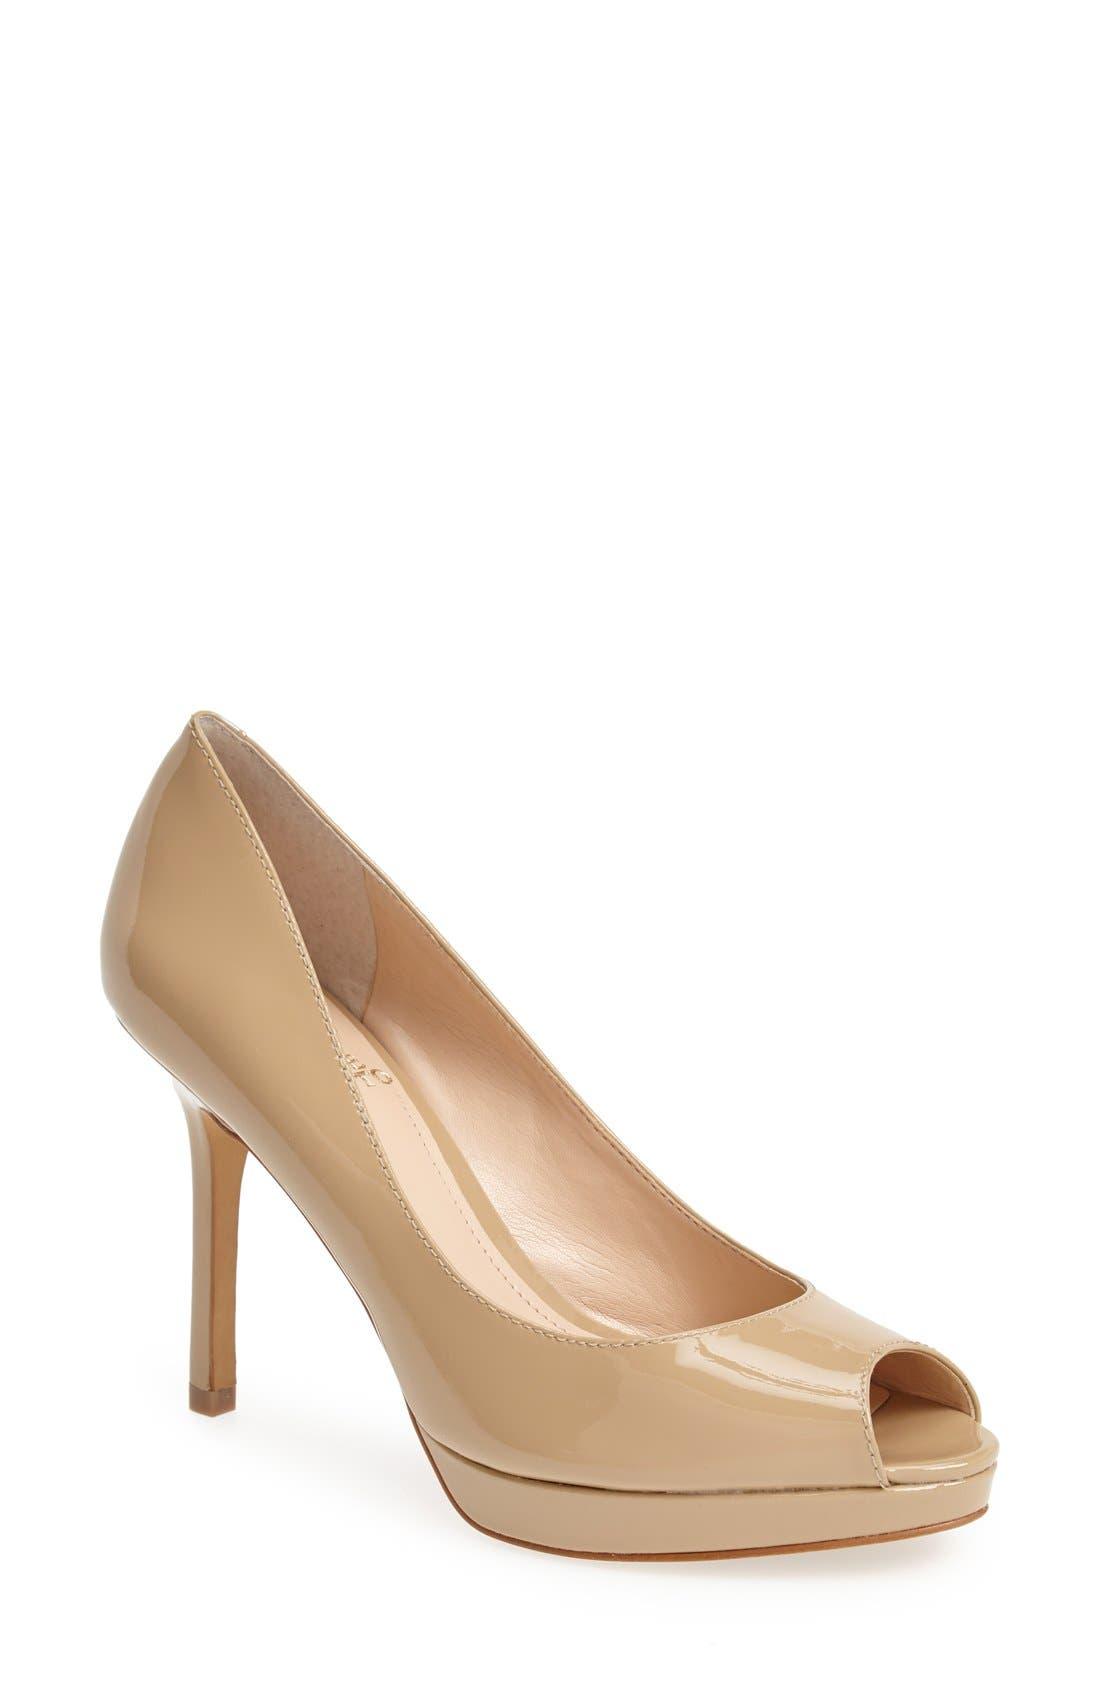 Alternate Image 1 Selected - Vince Camuto 'Coper' Peep Toe Leather Pump (Women)